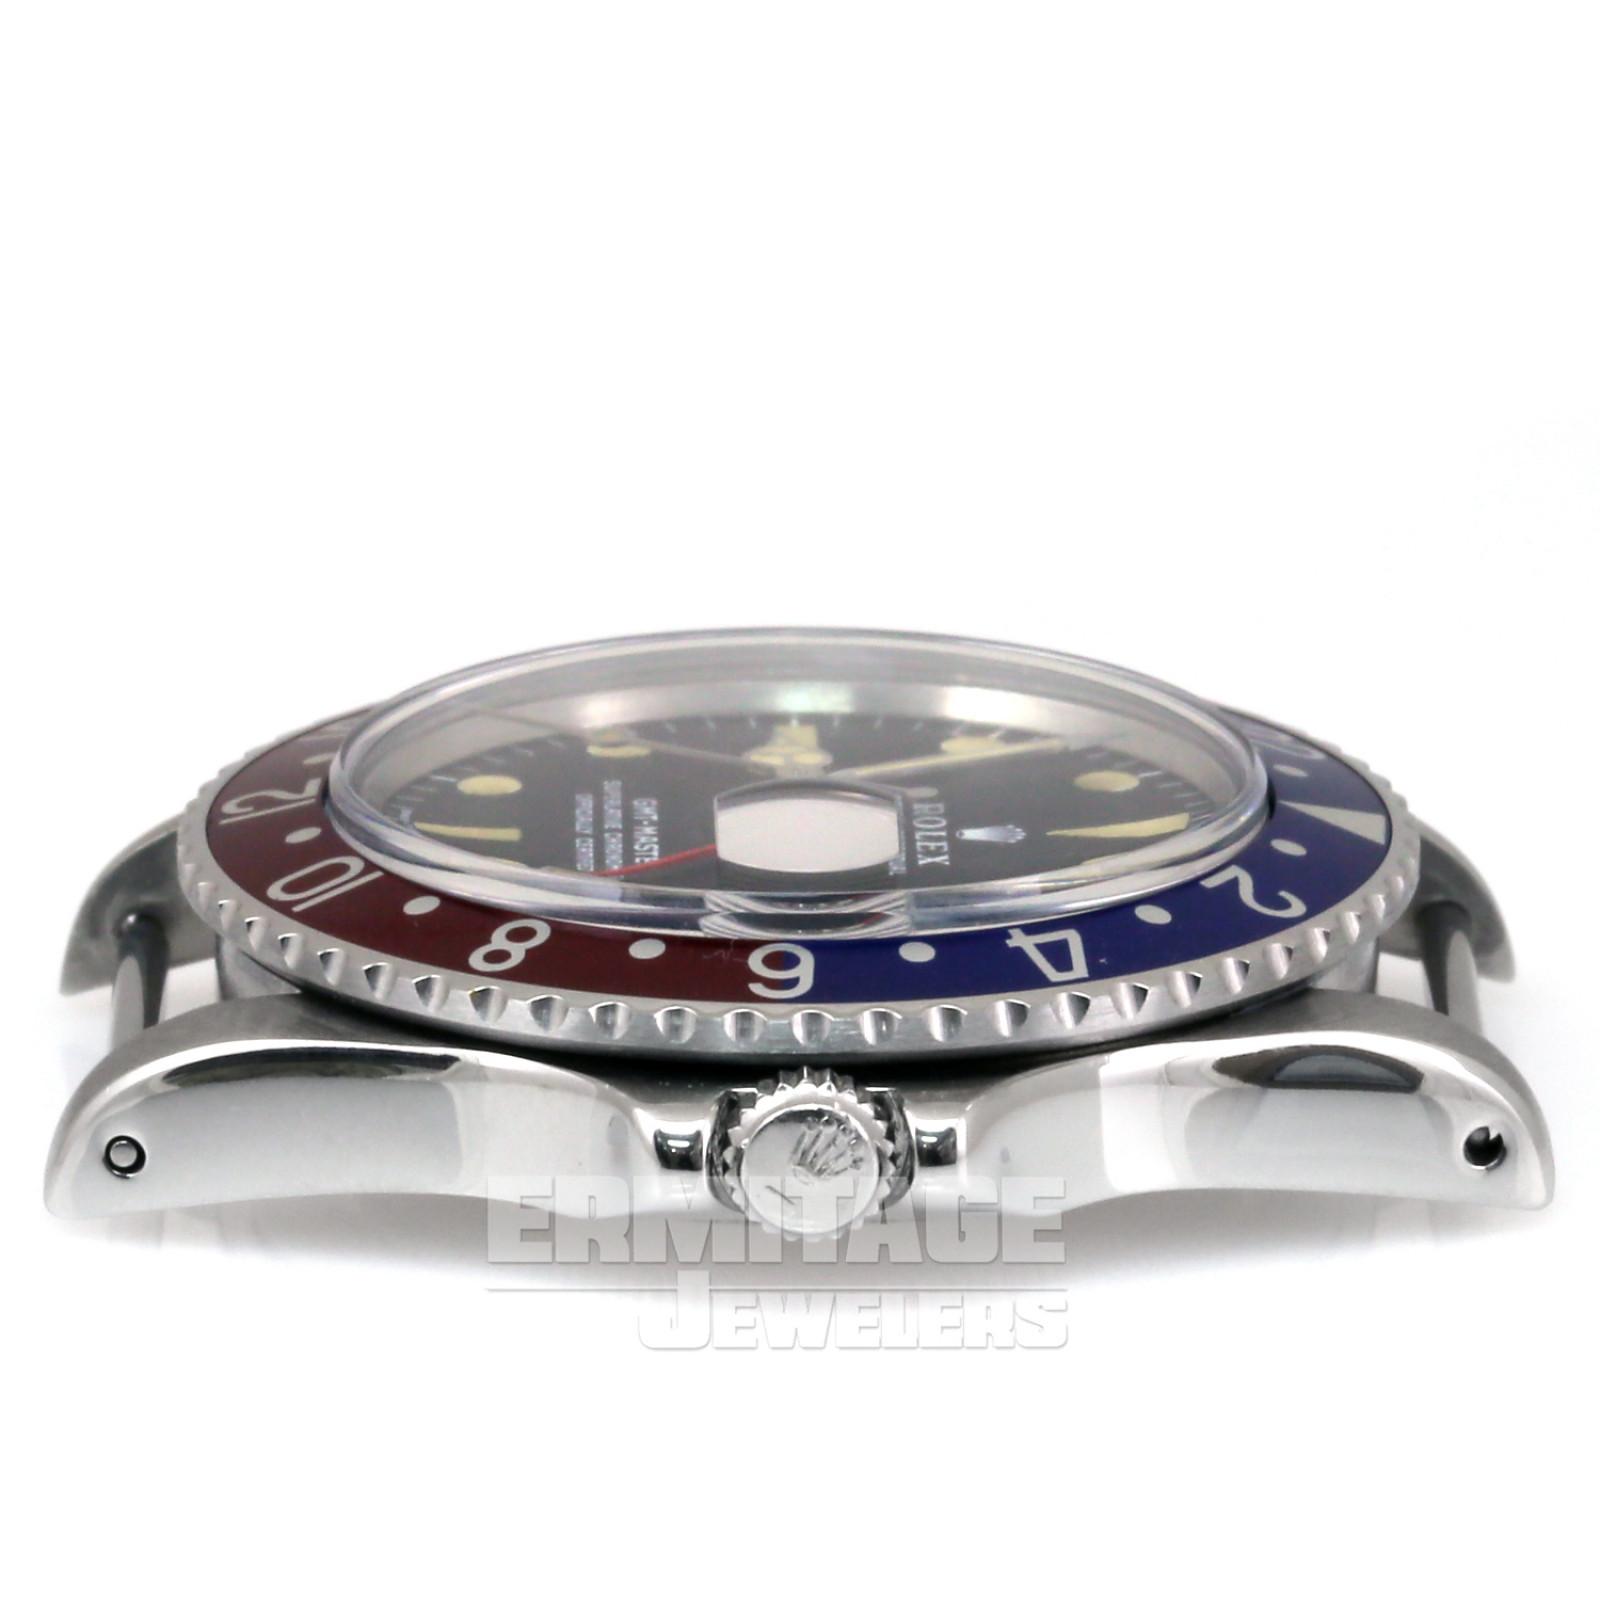 Vintage Rolex 1675 40 mm Blue & Red Ceramic